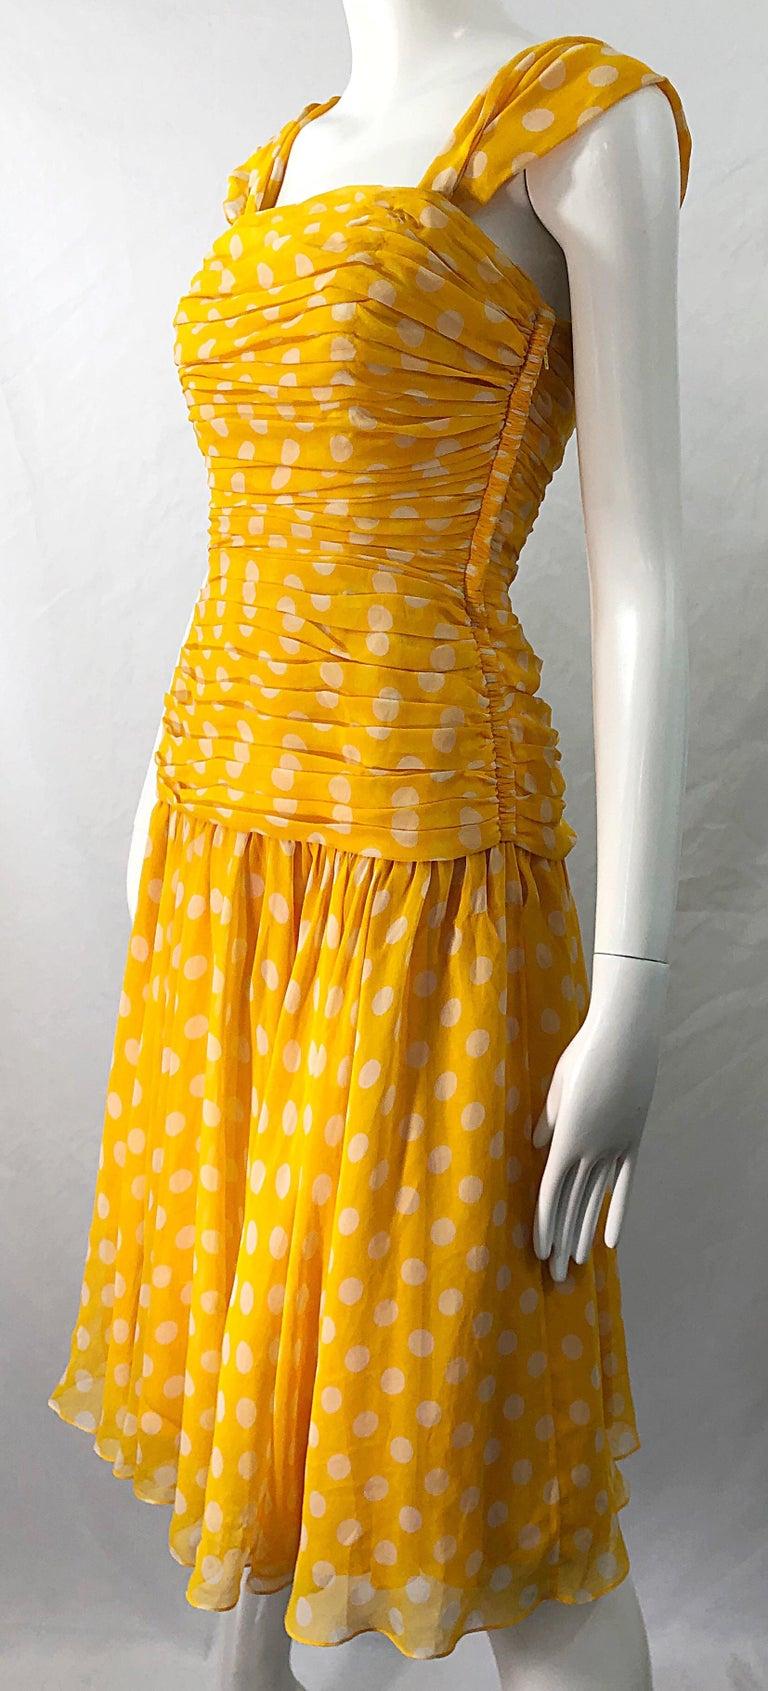 Adele Simpson 1980s Size 4 Yellow White Silk Chiffon Polka Dot Vintage 80s Dress For Sale 5